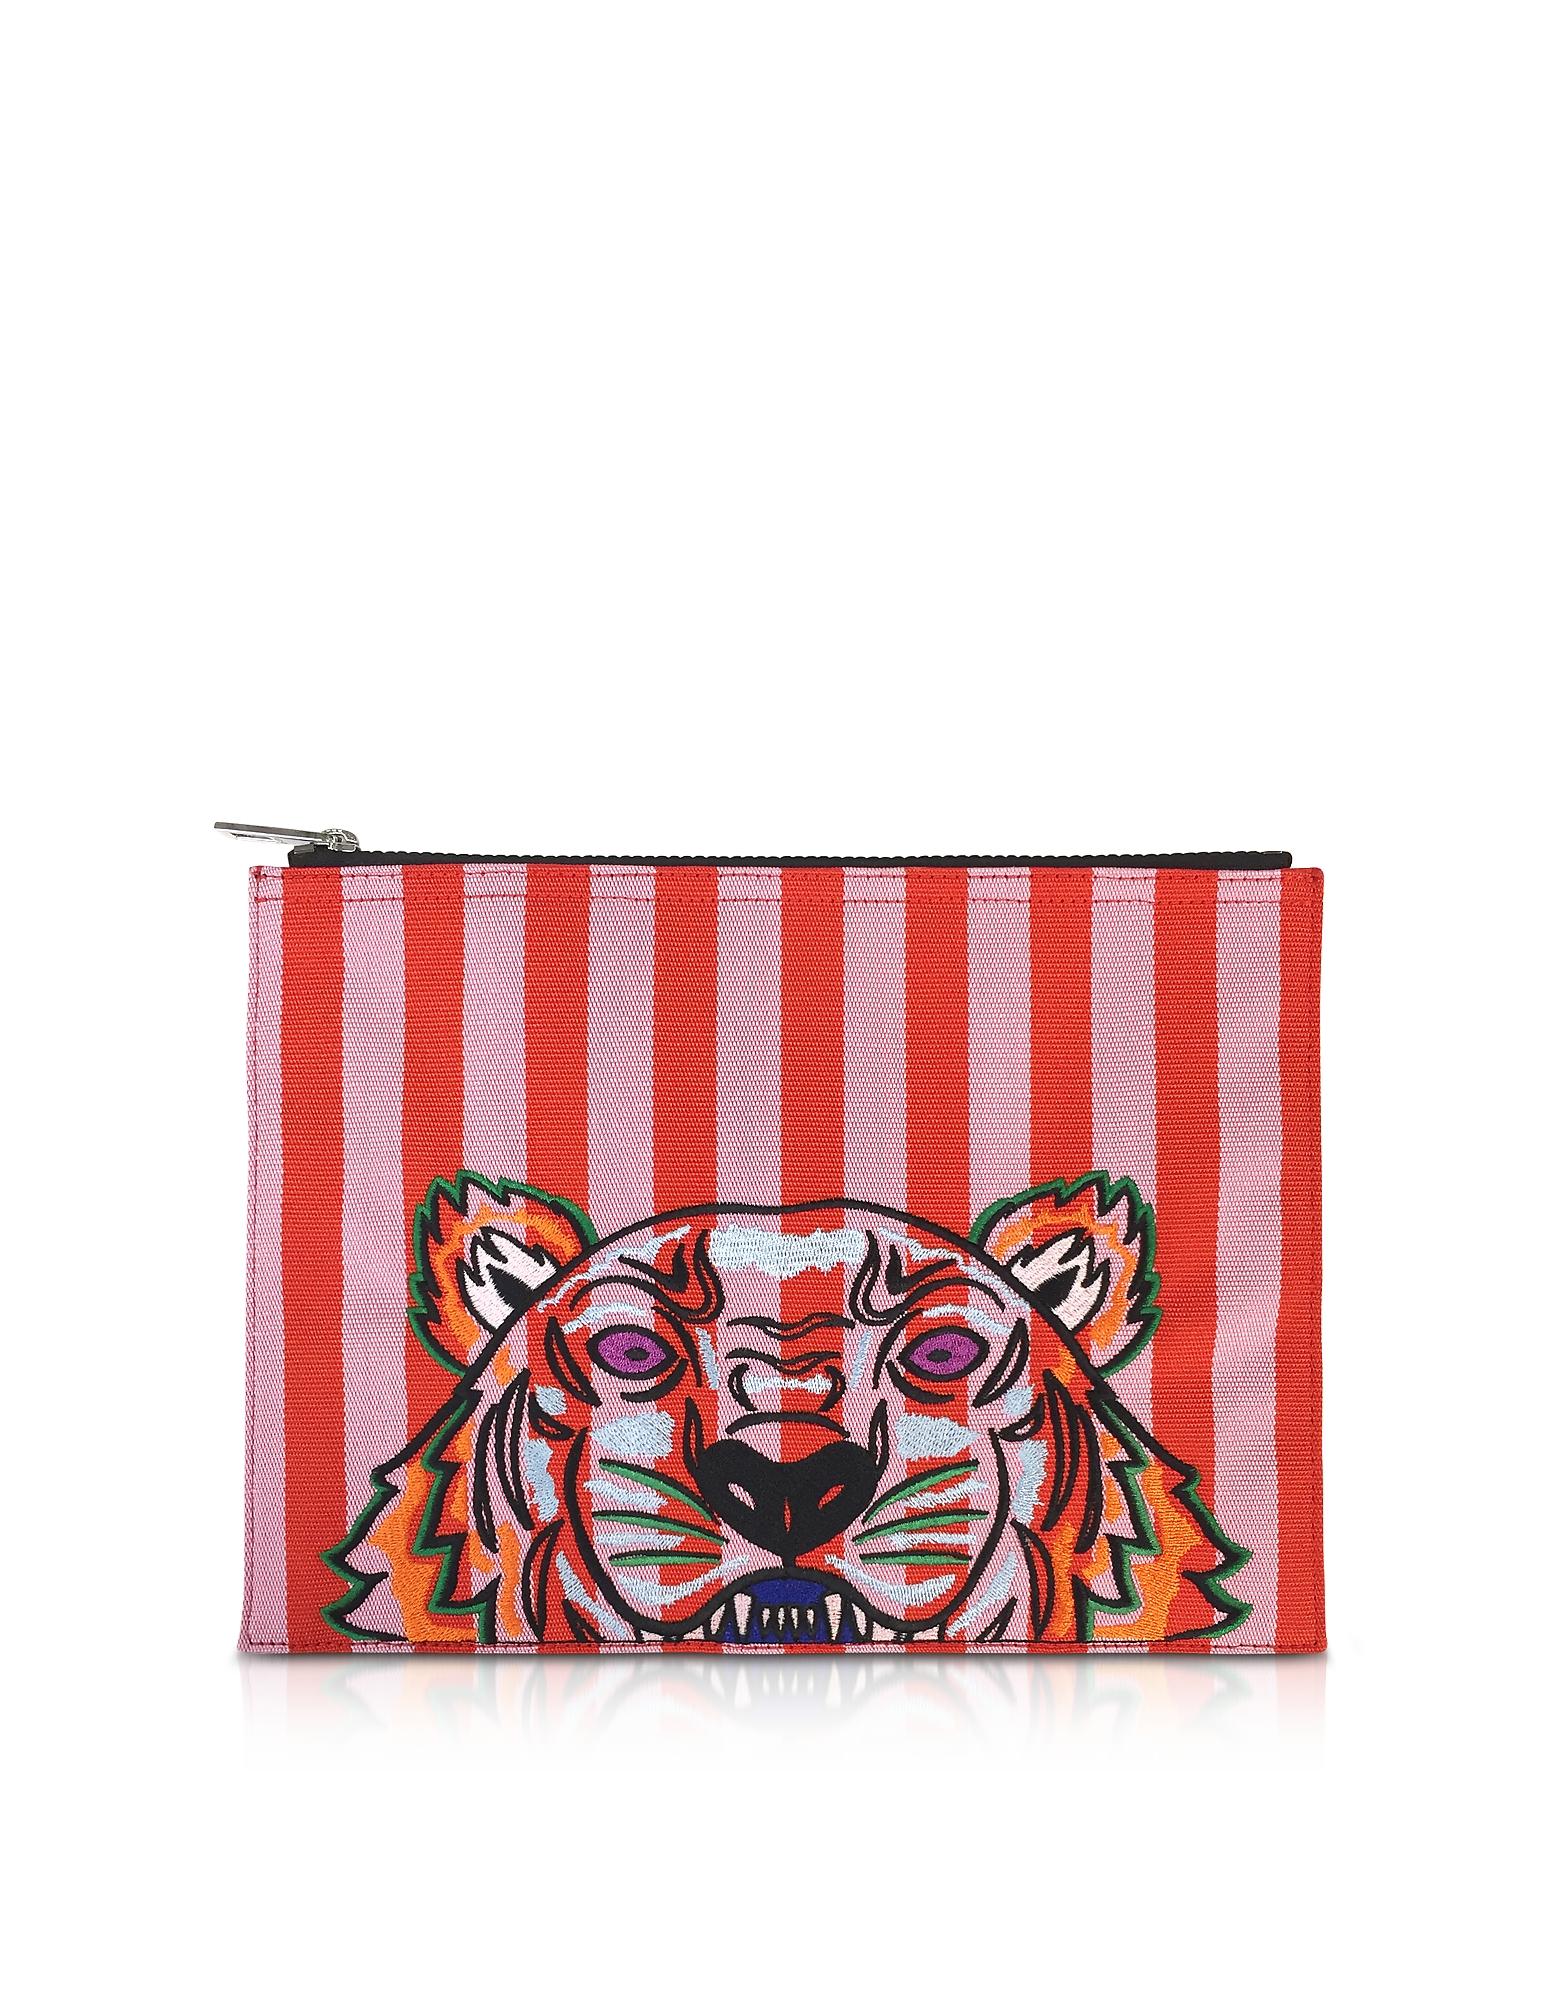 A4 Tiger Clutch in Canvas a Righe Ricamato